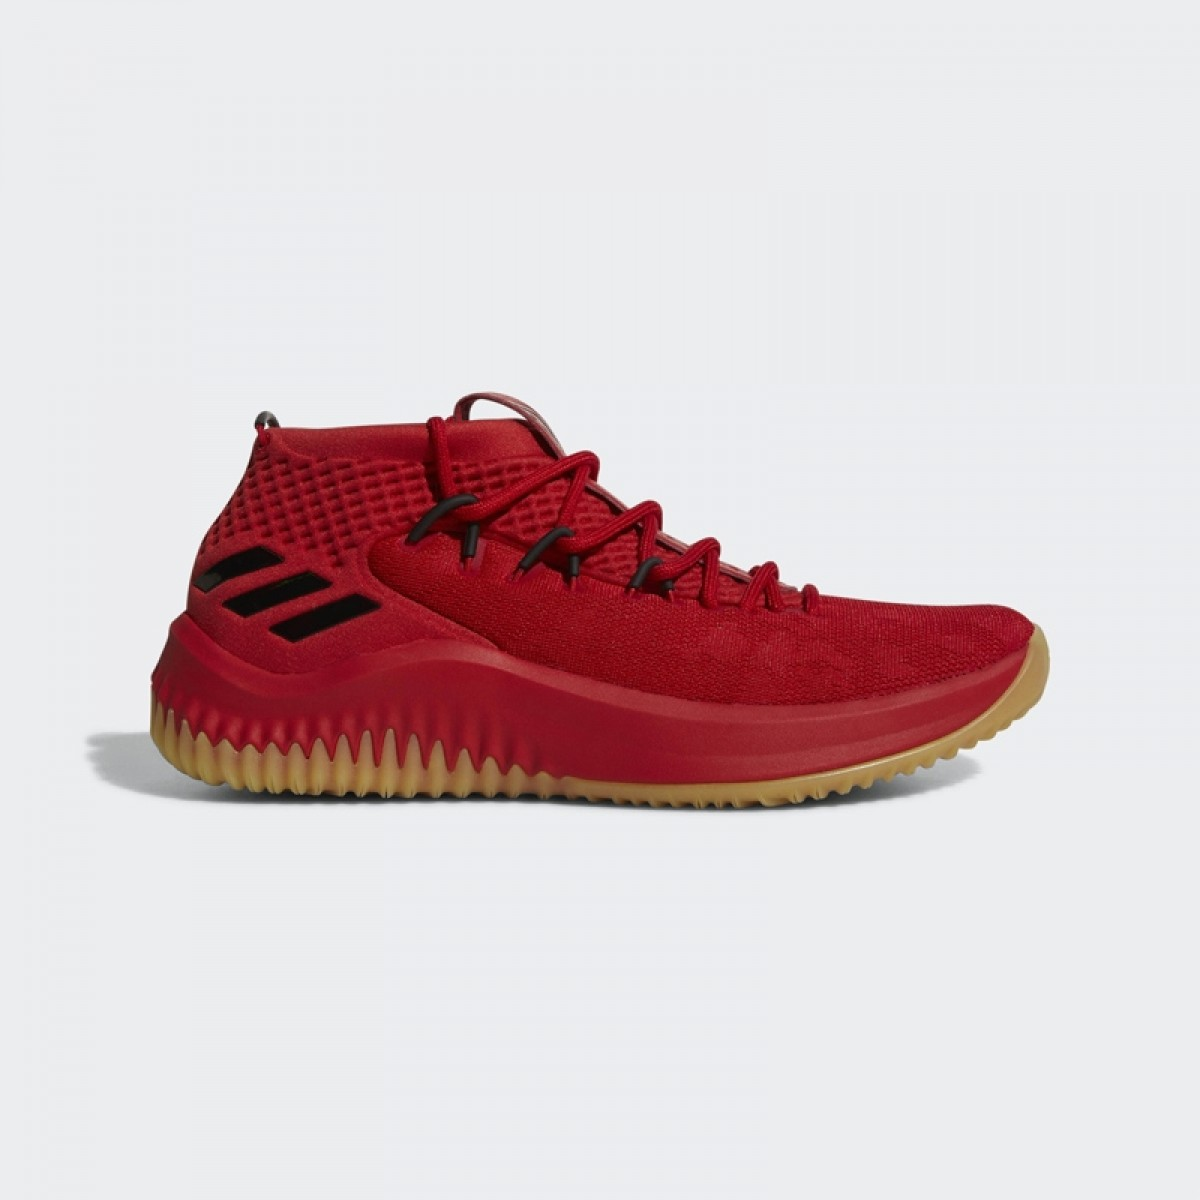 ADIDAS Dame 4 'Red Gum'